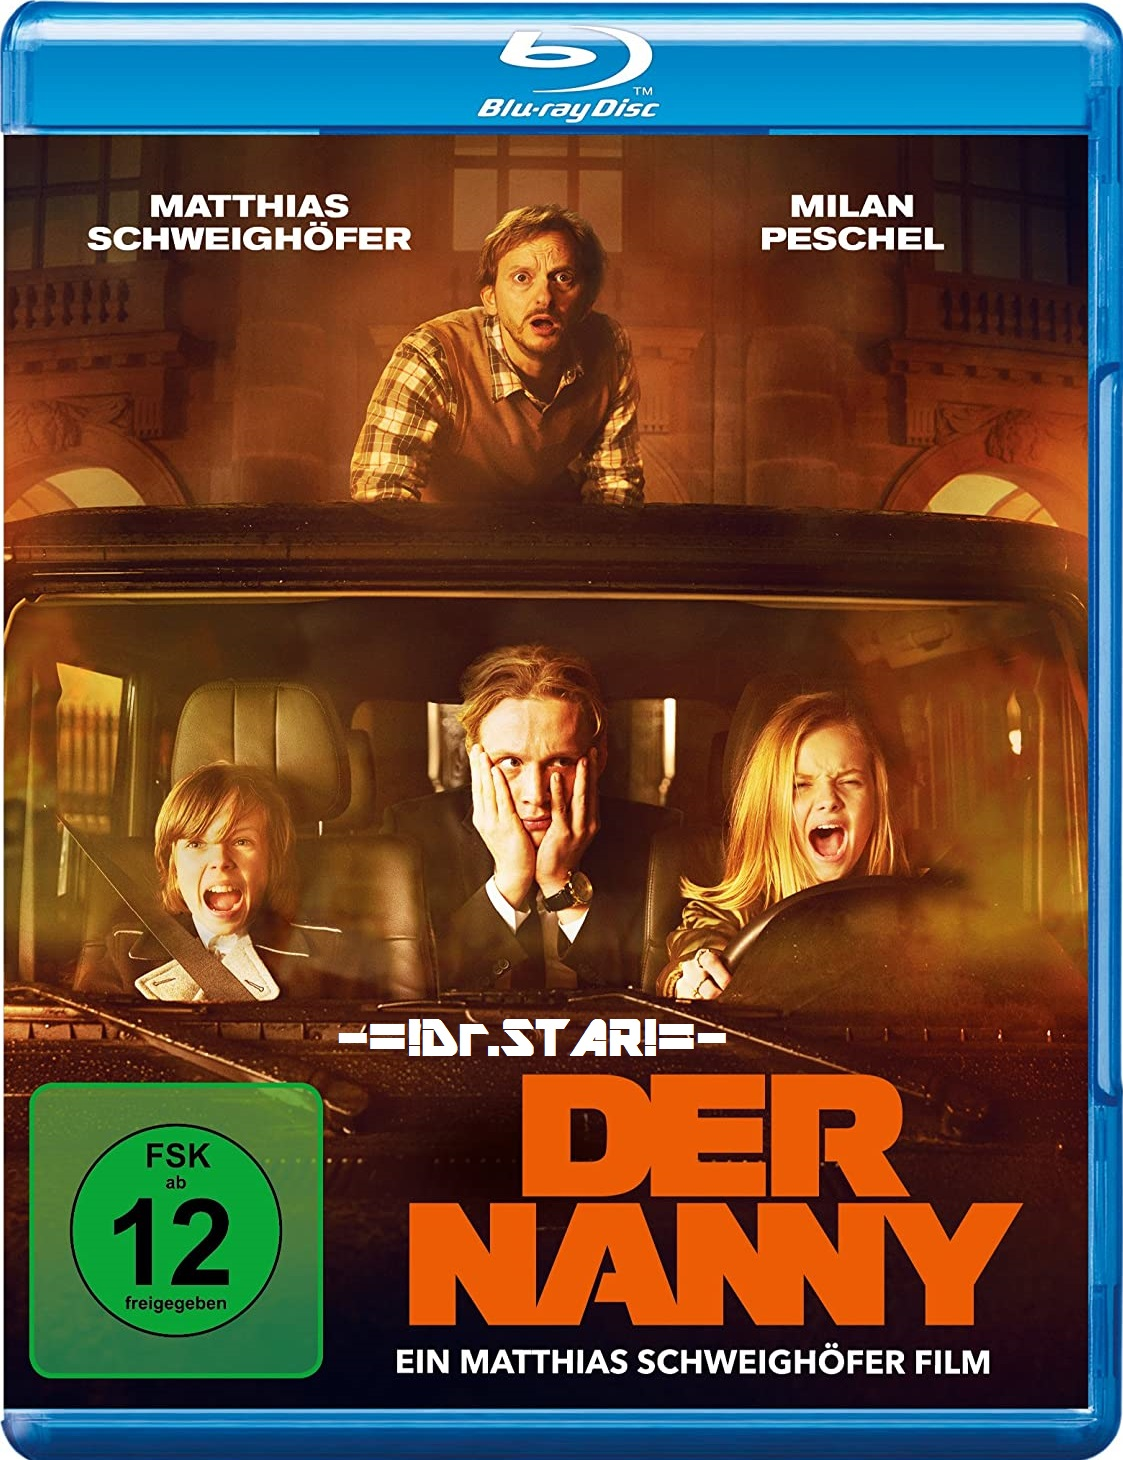 The Manny (2015) Hindi Dual 720p HDRIp Esubs DL